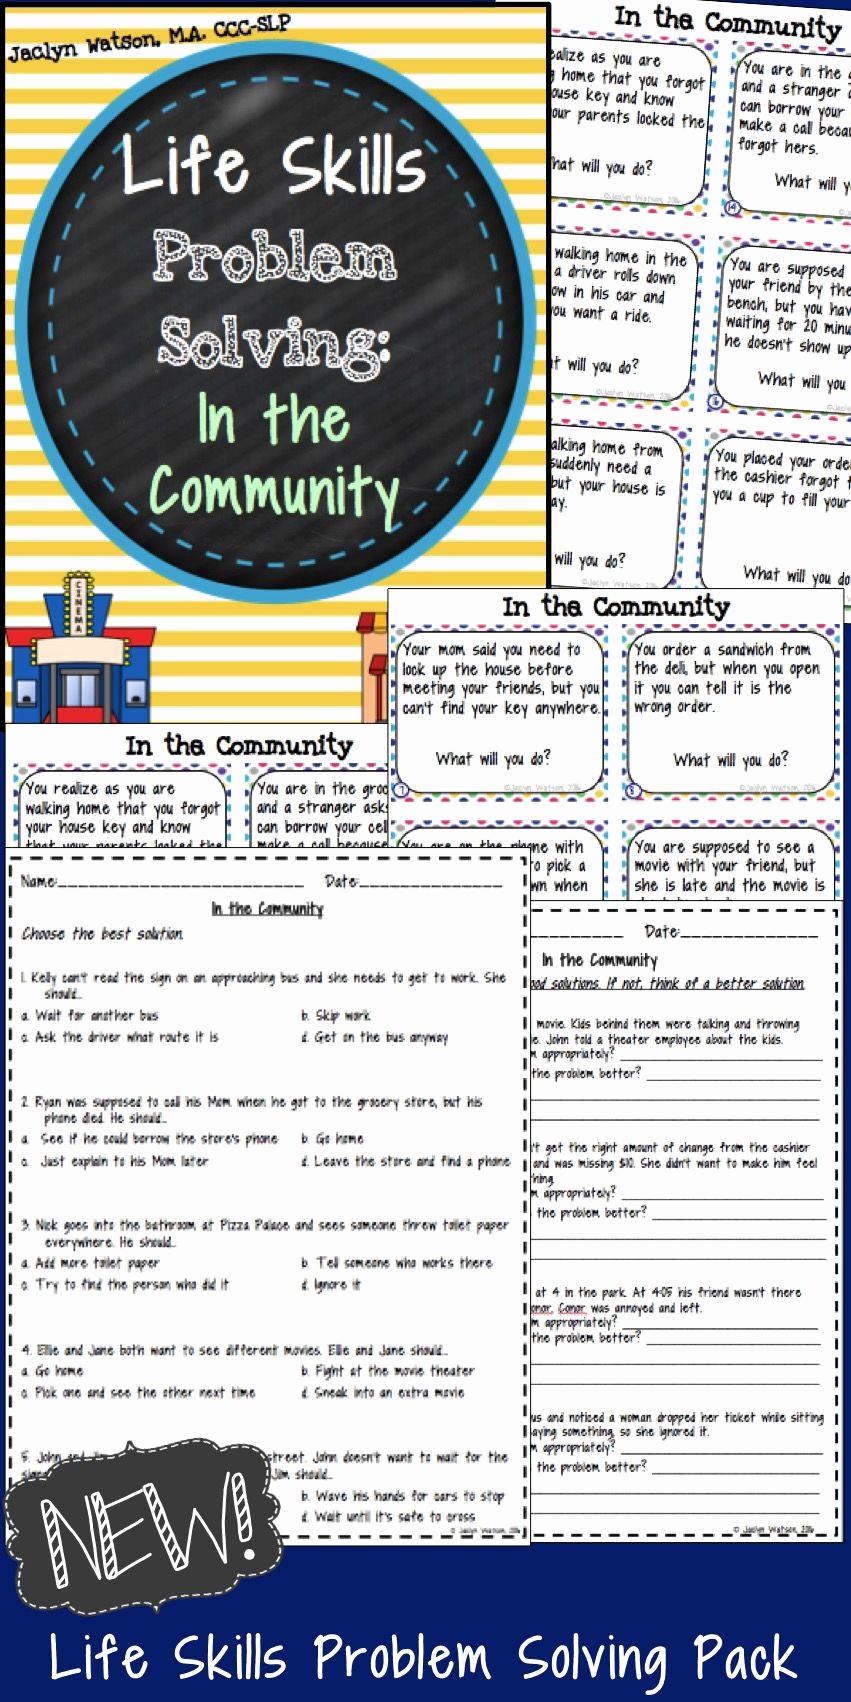 Middle School Life Skills Worksheets Inspirational Professionally 20 Middle School Life Skills Worksheets